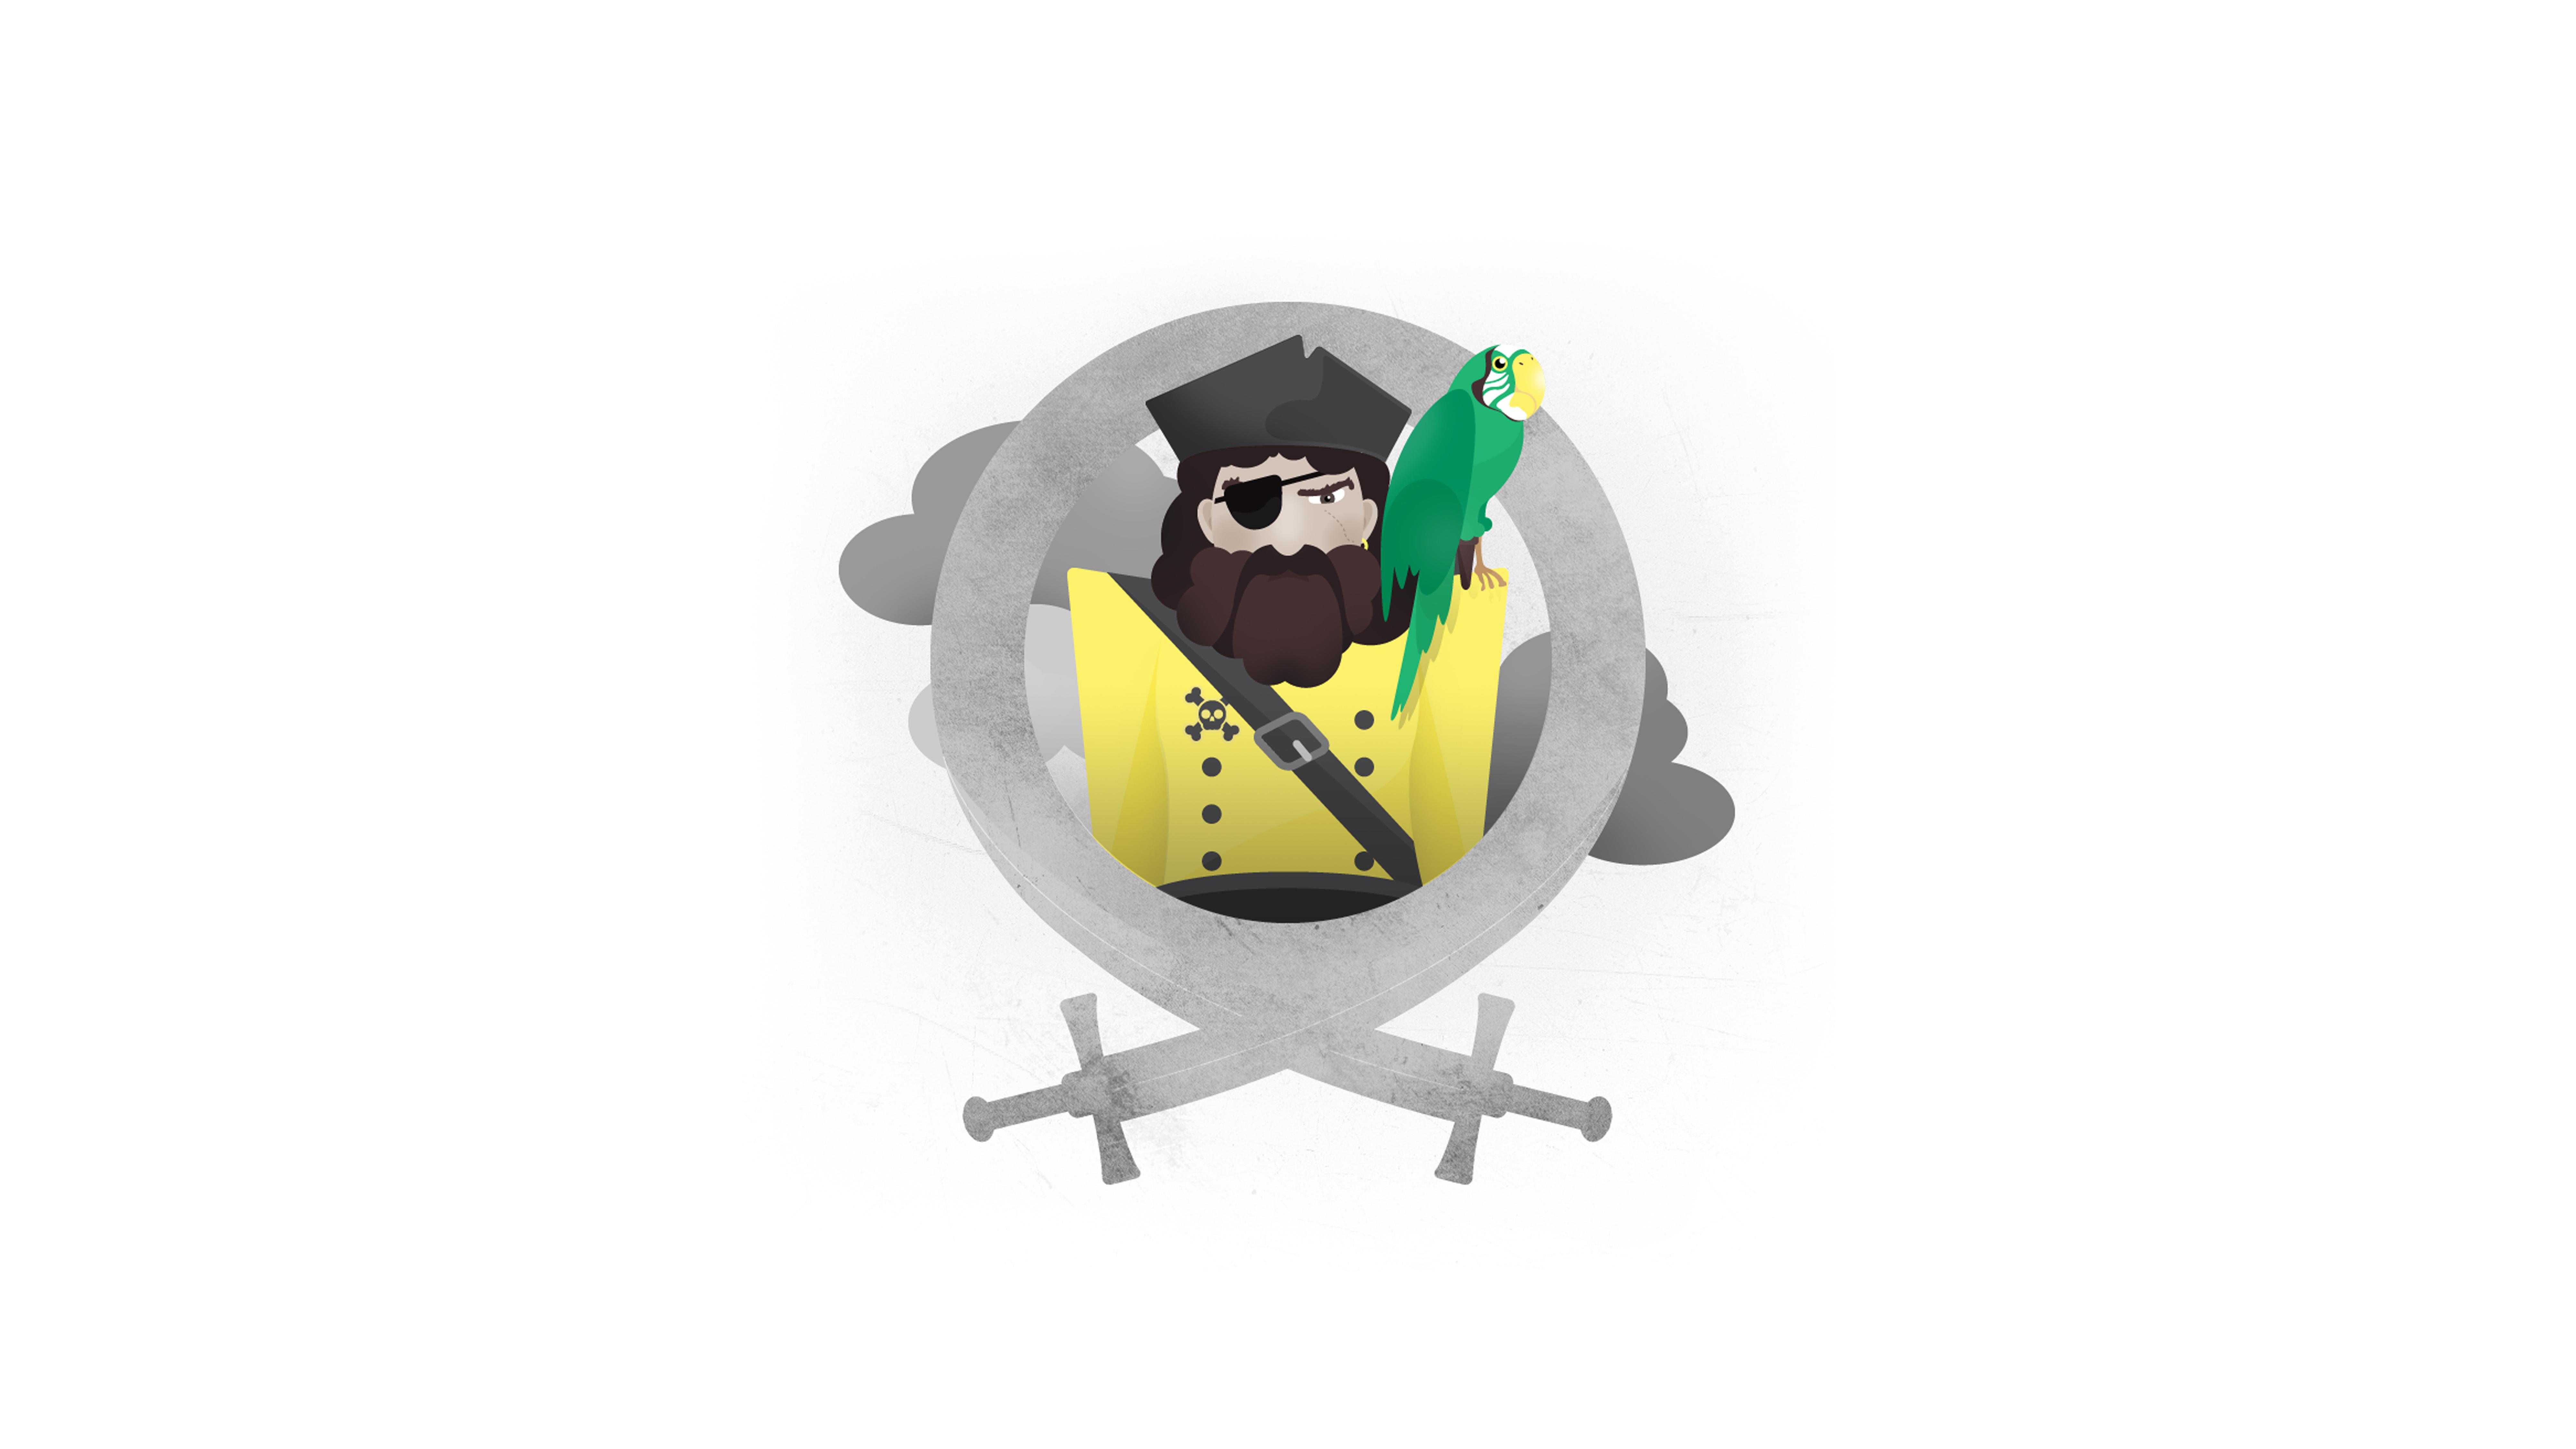 PB-pirate